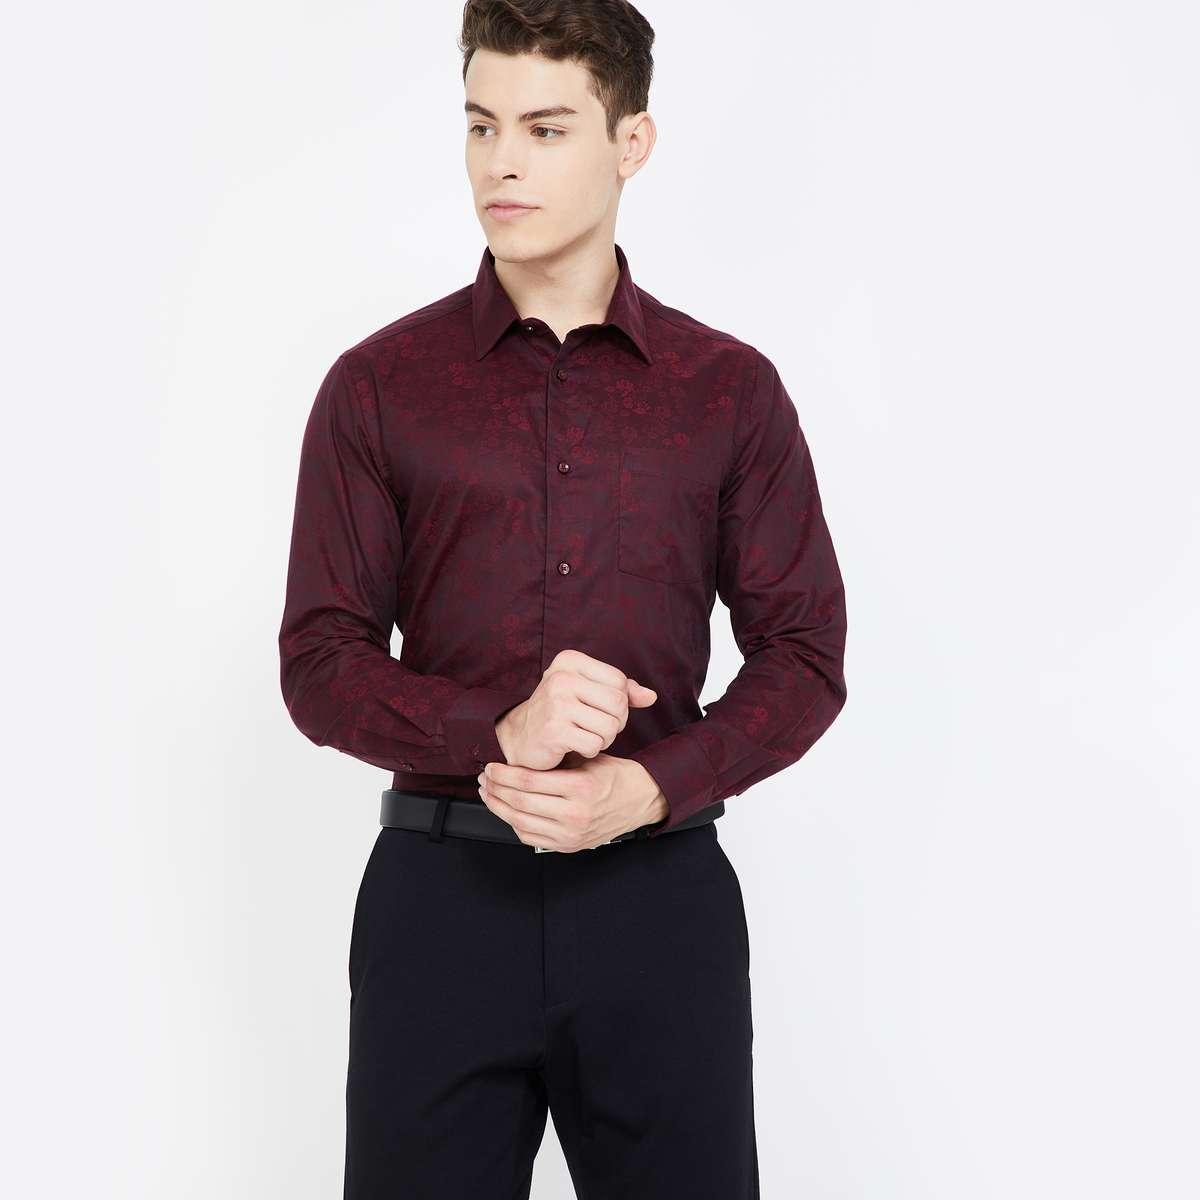 2.BLACKBERRYS Textured Full Sleeves Slim Fit Formal Shirt